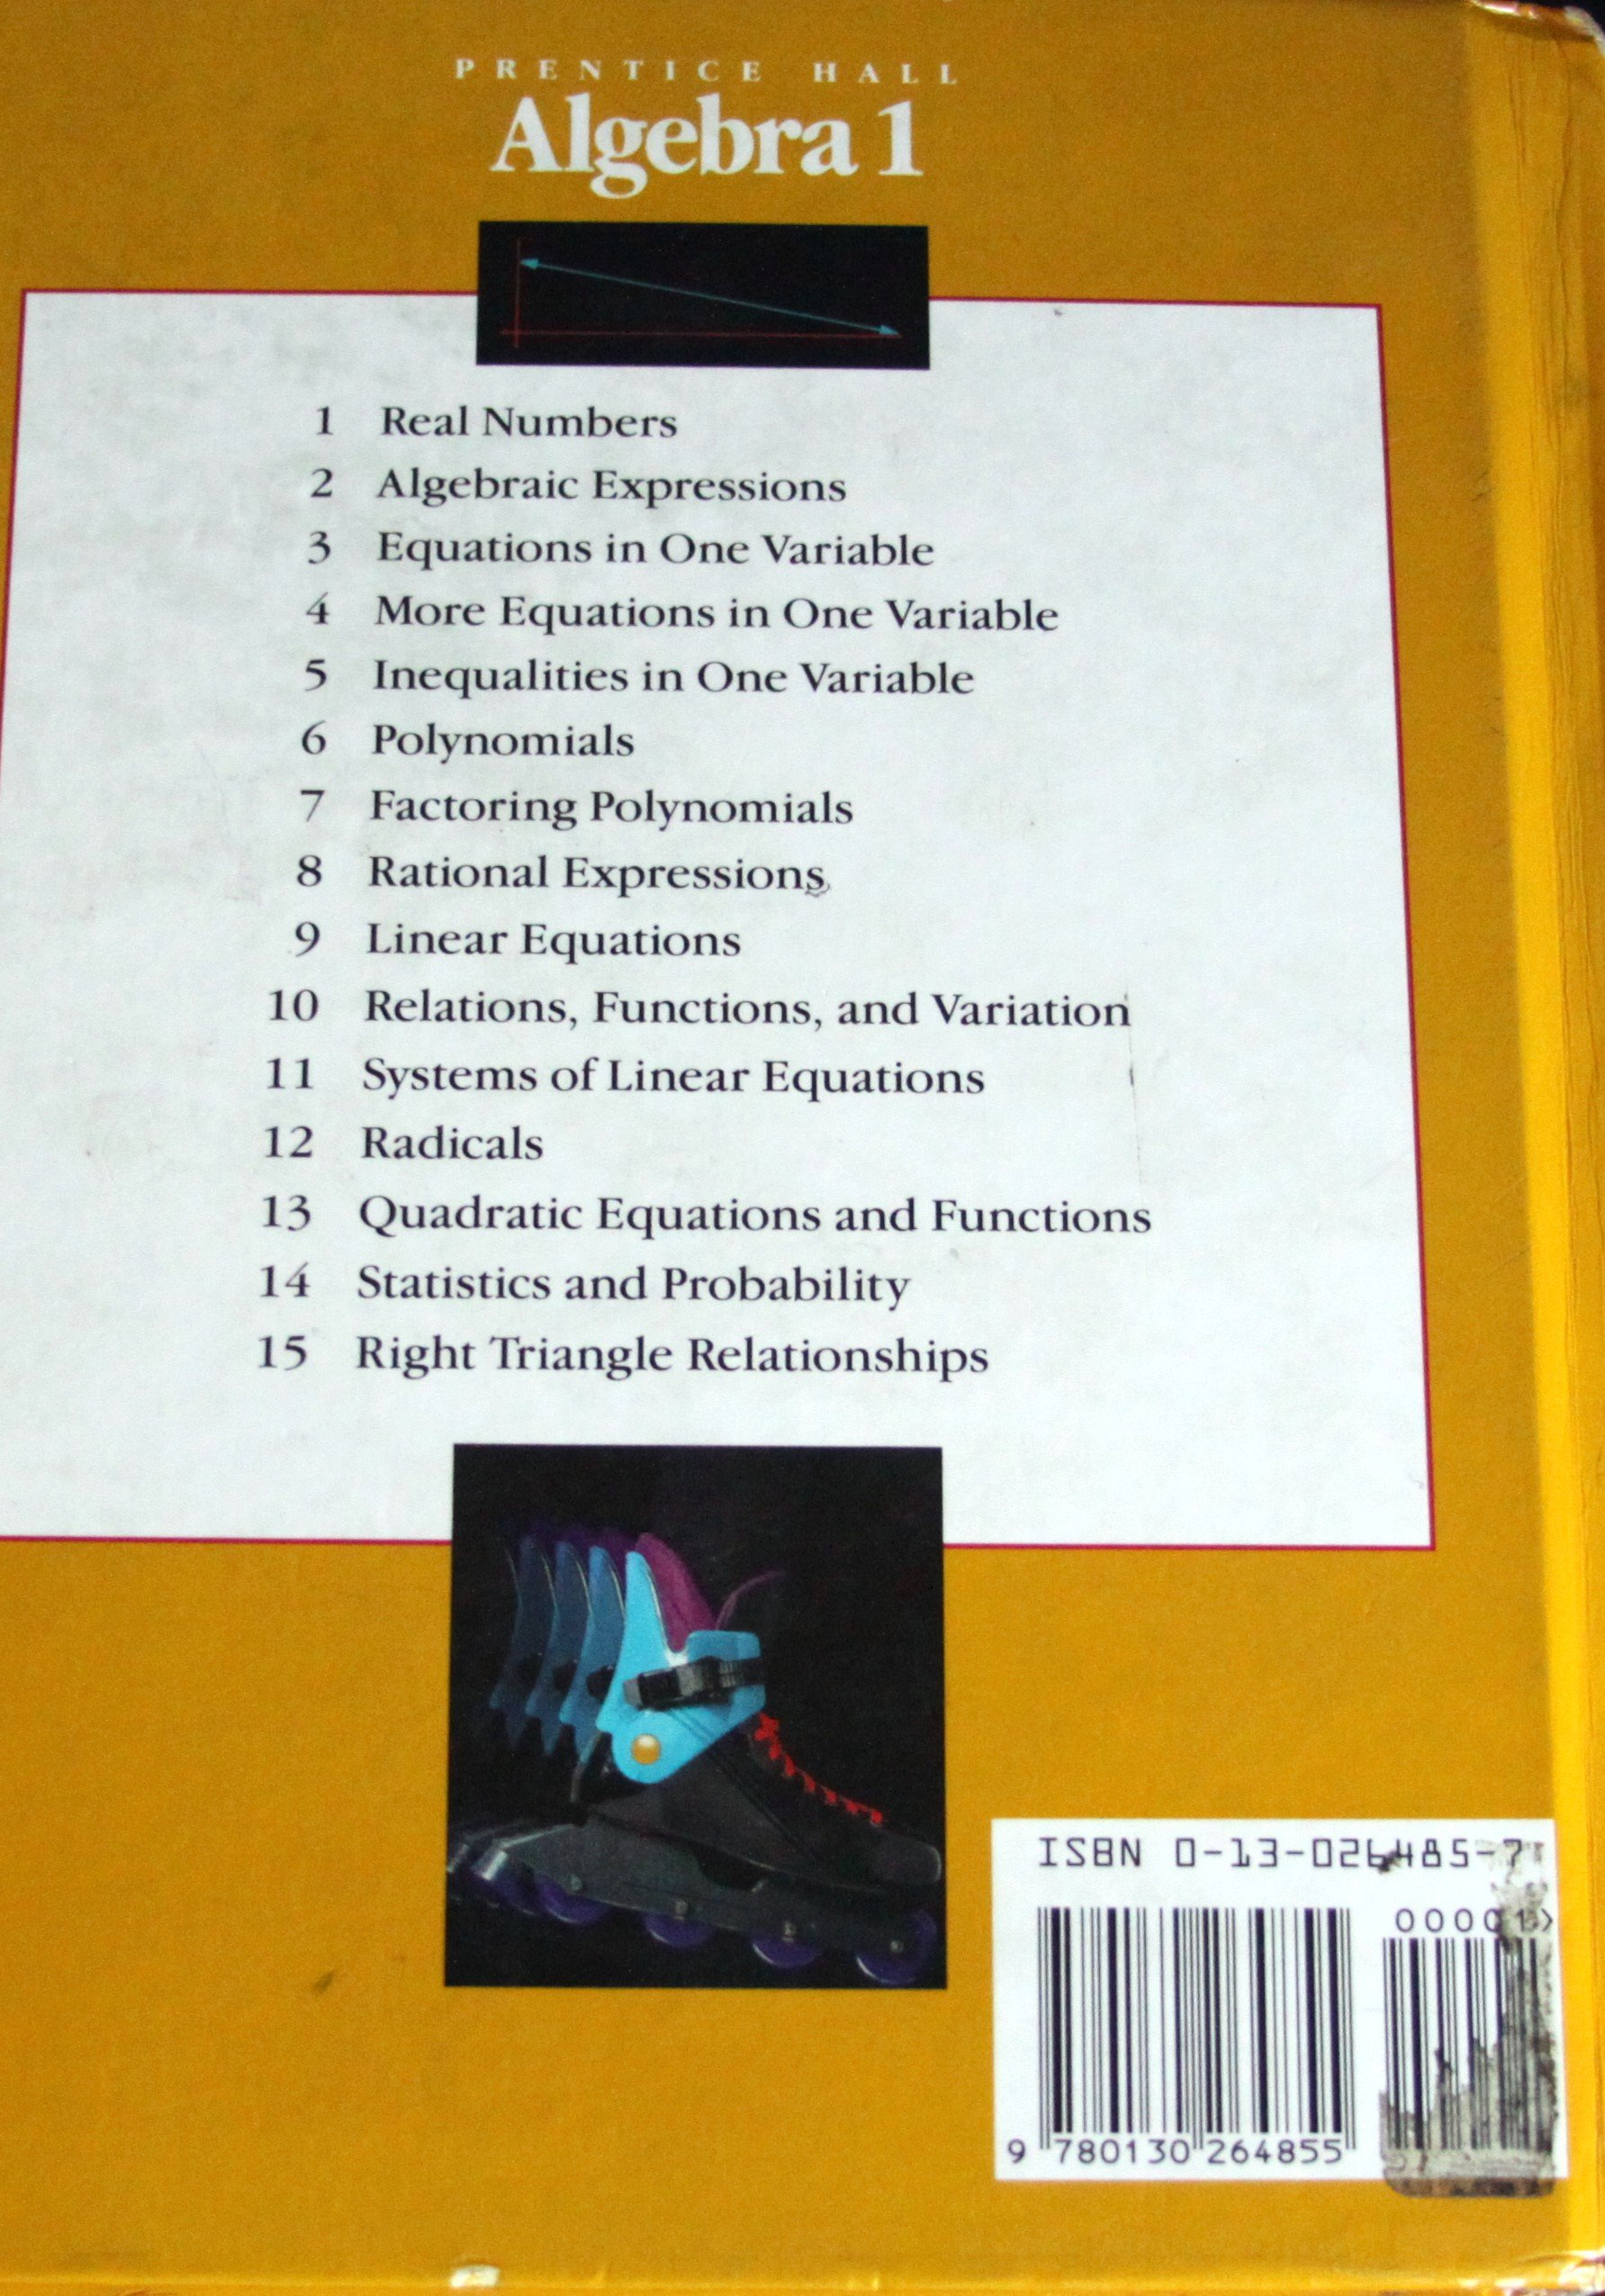 Amazon com: Algebra 1 (9780130264855): Inc  Prentice-Hall: Books